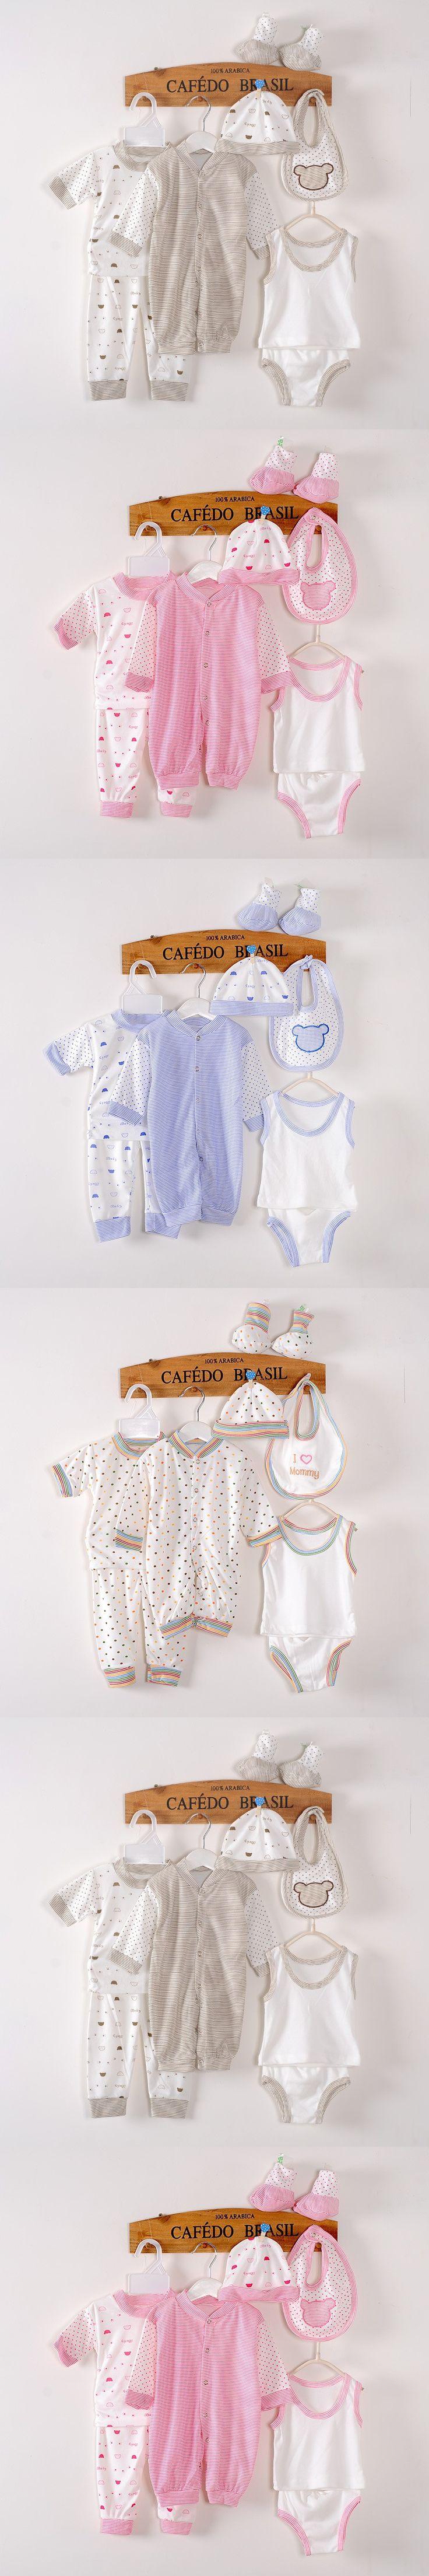 8PCS/0-3M/High quality Band 2016 new Spring summer autumn newborn clothing set 100% cotton new born baby boy girl clothes